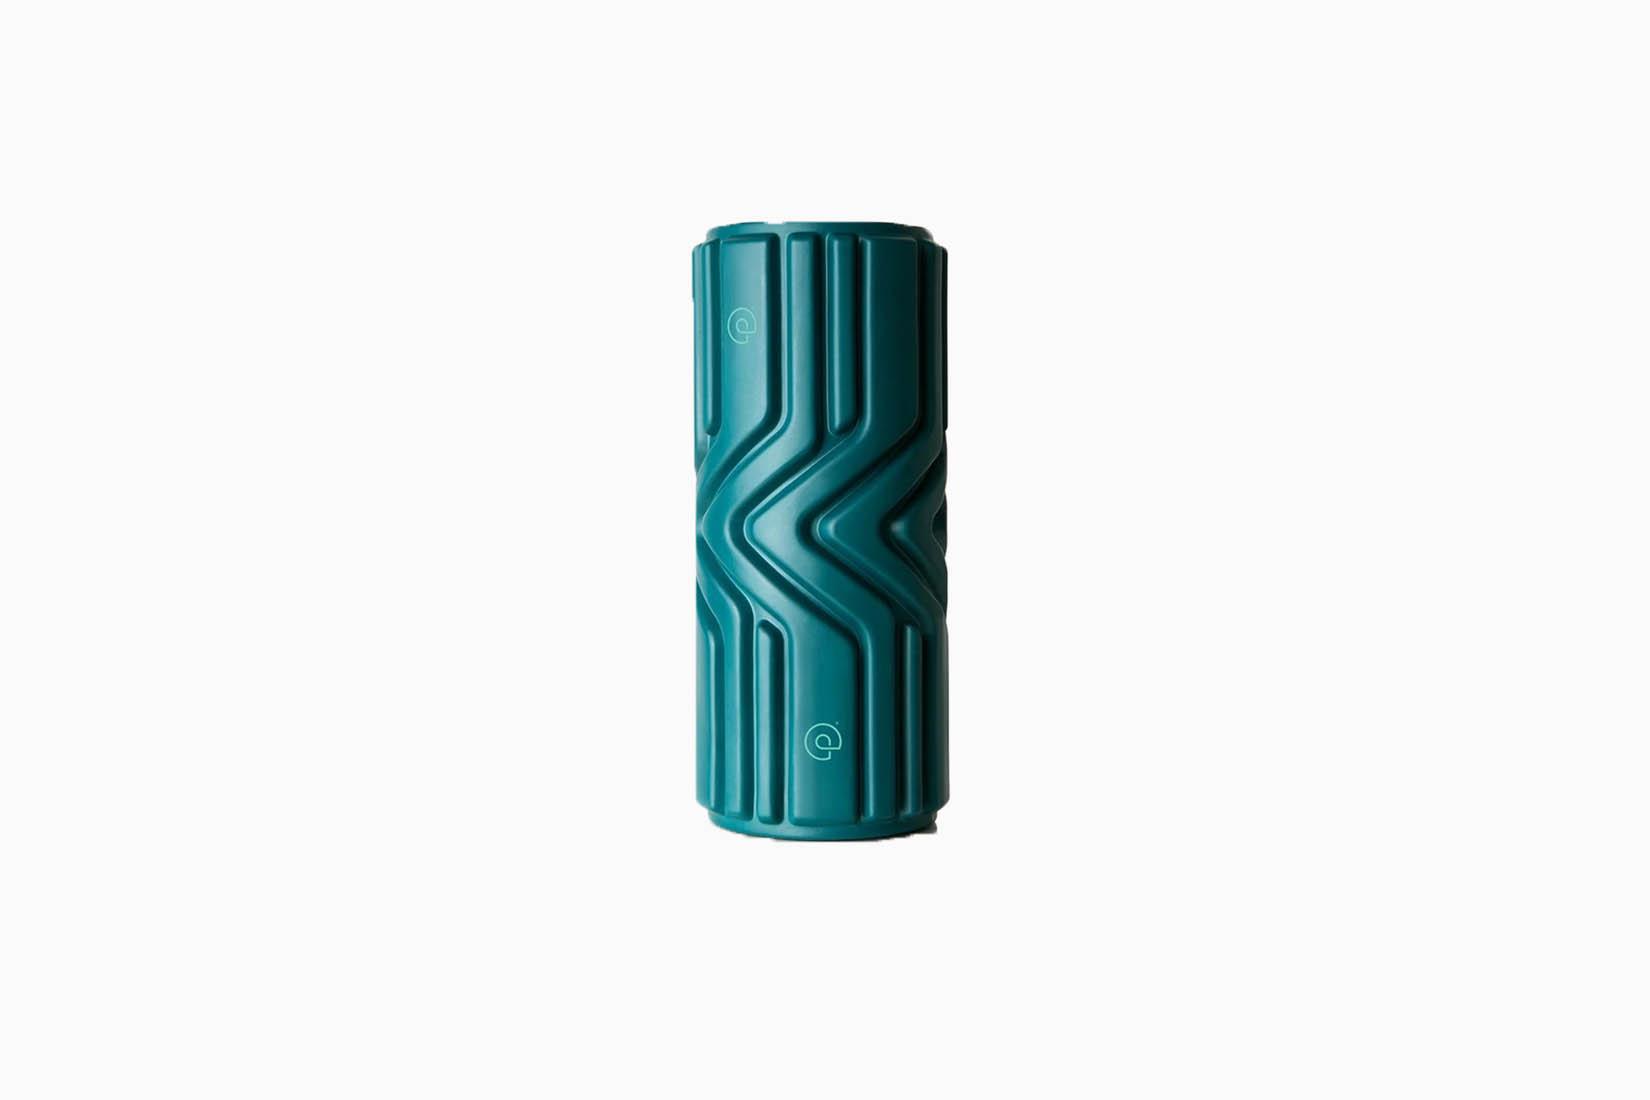 best home gym equipment p volve foam roller review - luxe digital